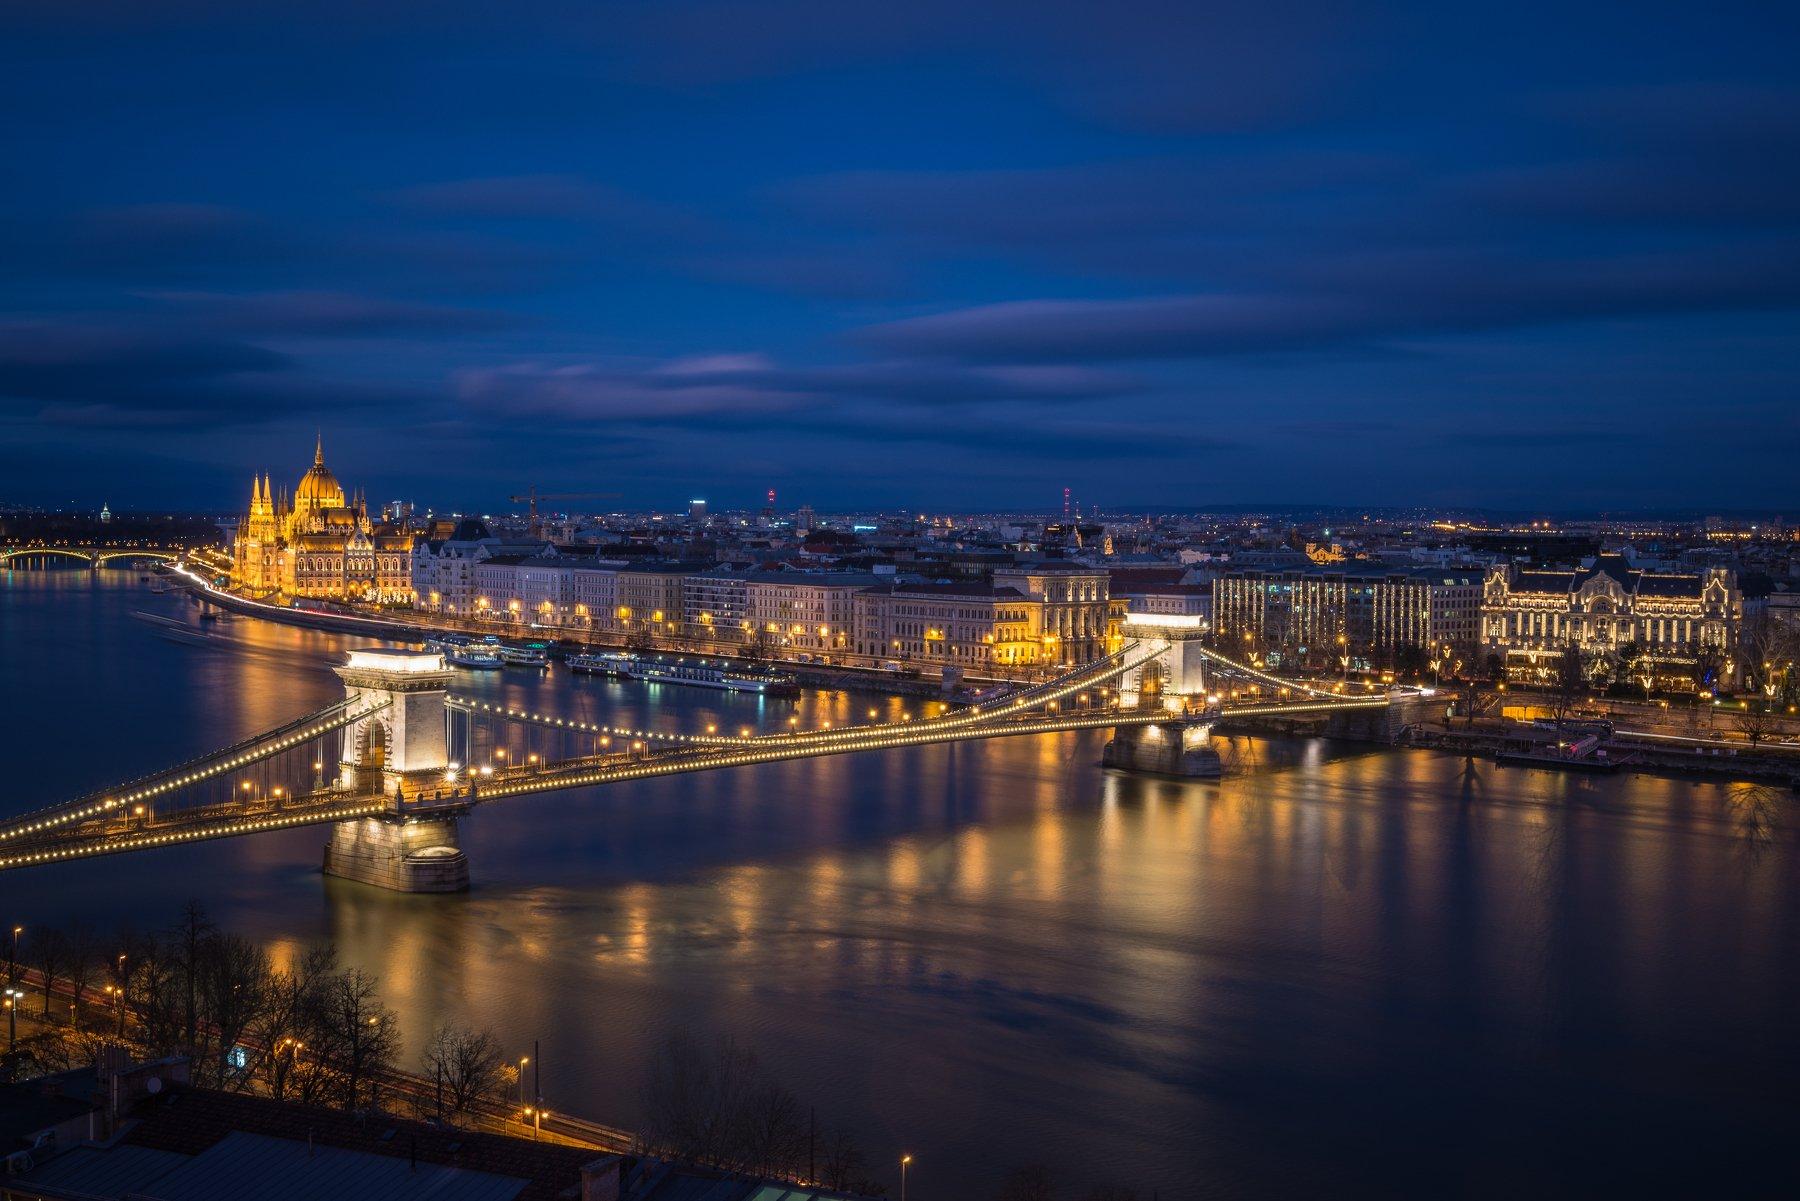 цепной мост. парламент. будапешт. 2017, Oleg